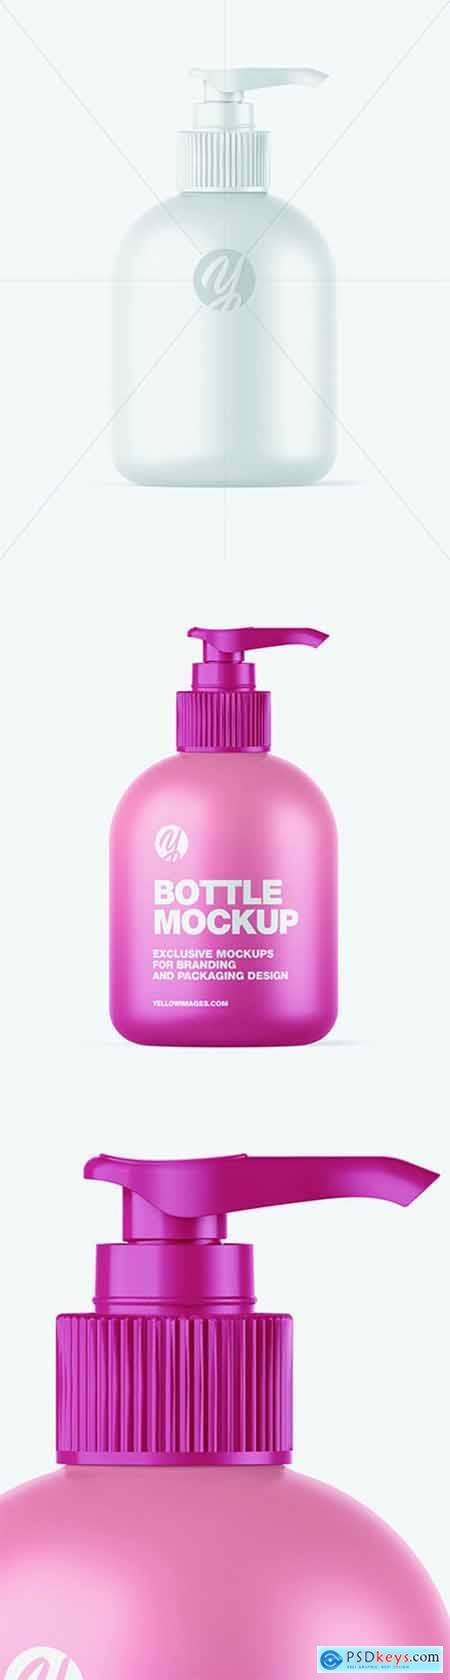 Matte Sanitizer Bottle w- Closed Pump Mockup 68833